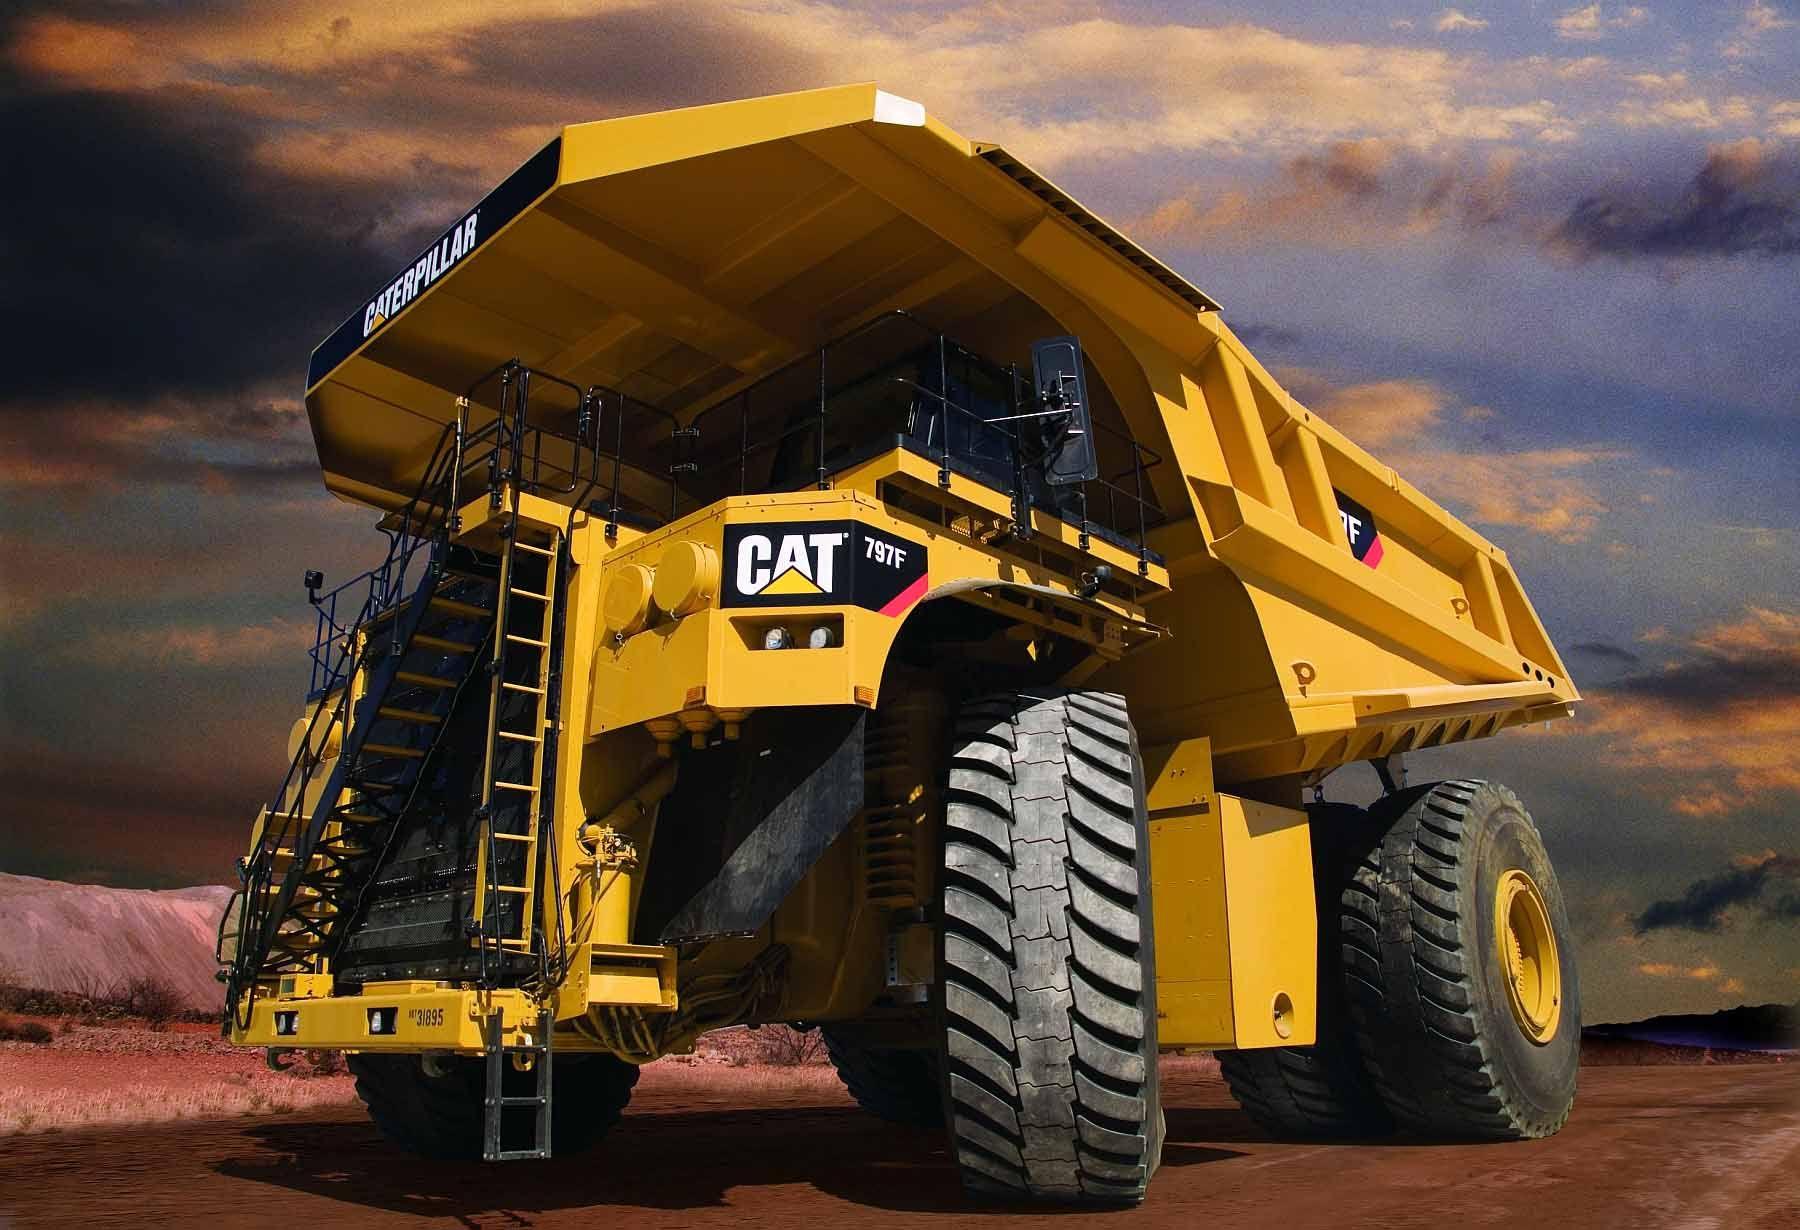 Cat 797f cat 797f 1 16 trains heavy construction equipment caterpillar equipment - Caterpillar wallpaper ...